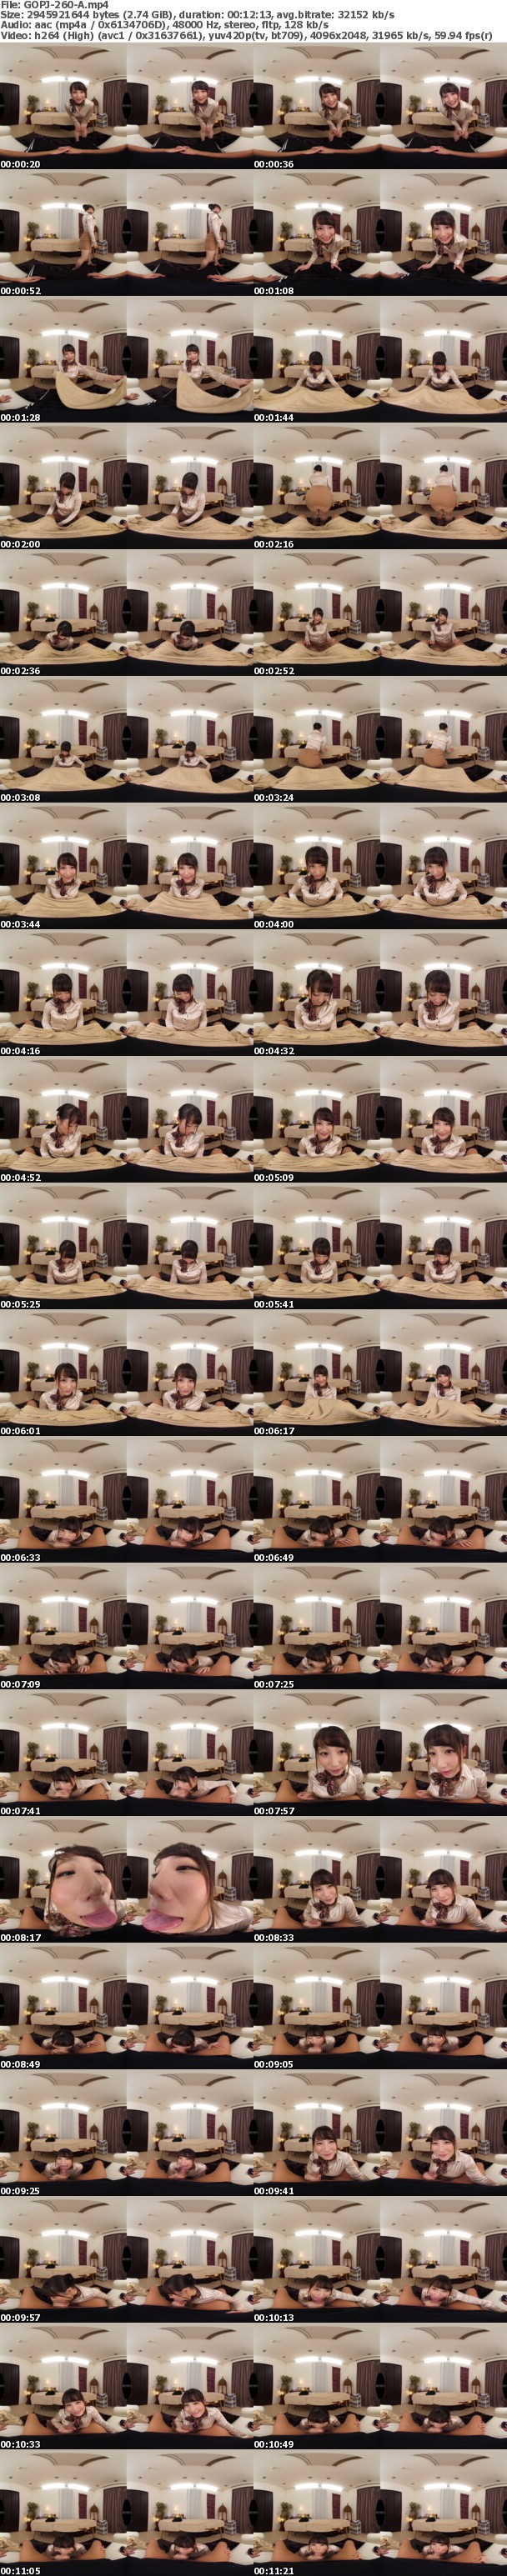 (VR) GOPJ-260 HQ 劇的超高画質 倉多まお エステ嬢まおが魅せる!鼠径部超絶マッサージテク 口内と手で施術する丹念なリンパ刺激で精子もズビュッと搾り取られ超快感!前立腺も巨尻とキツマンで擦られ再勃起フルチャージで中出しデトックス! 【2発射】